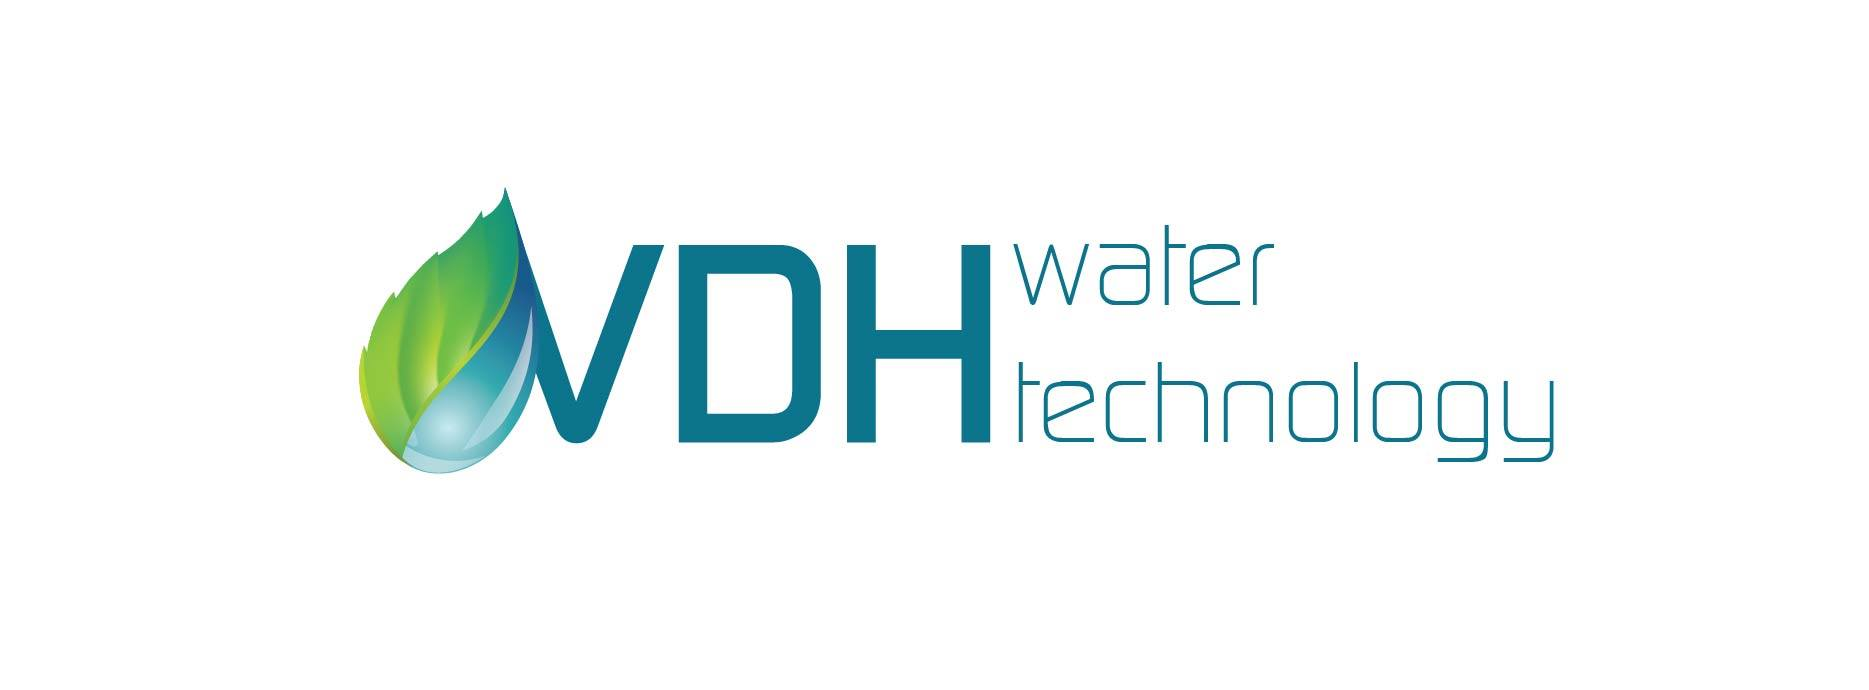 VDH Watertechnology-logo